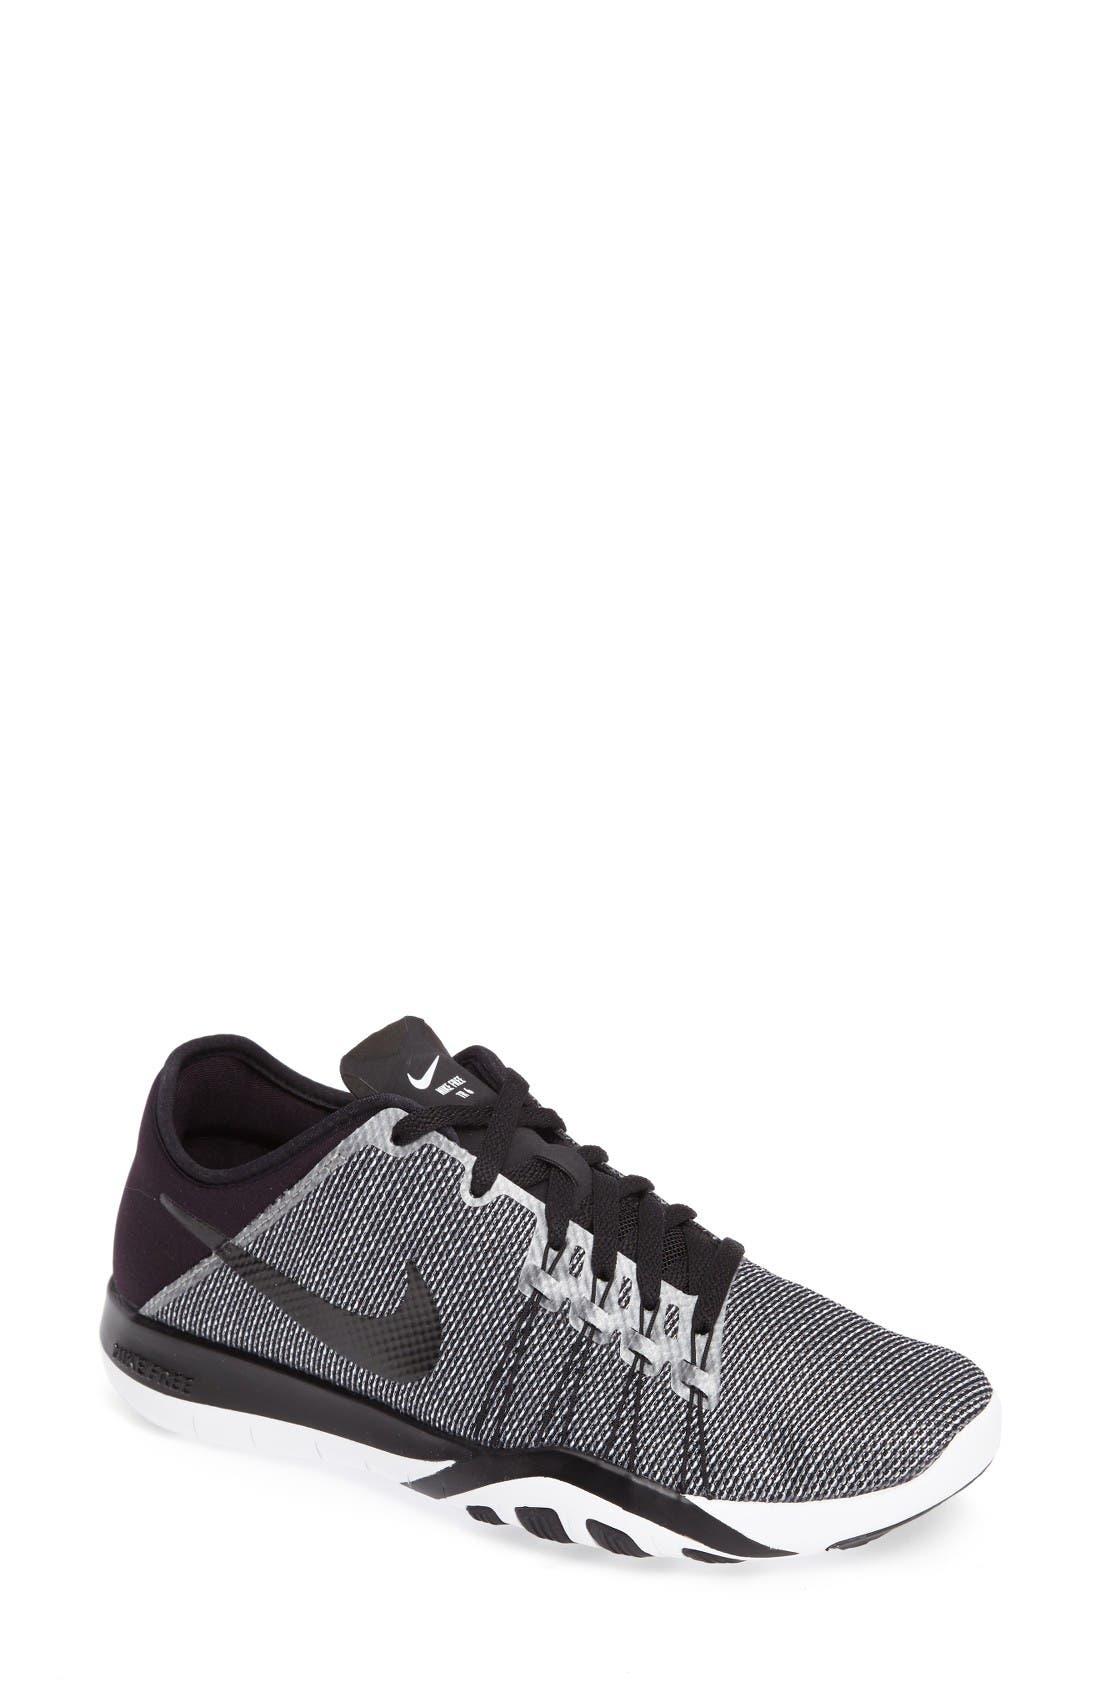 Main Image - Nike Free TR Fit 6 Training Shoe (Women)